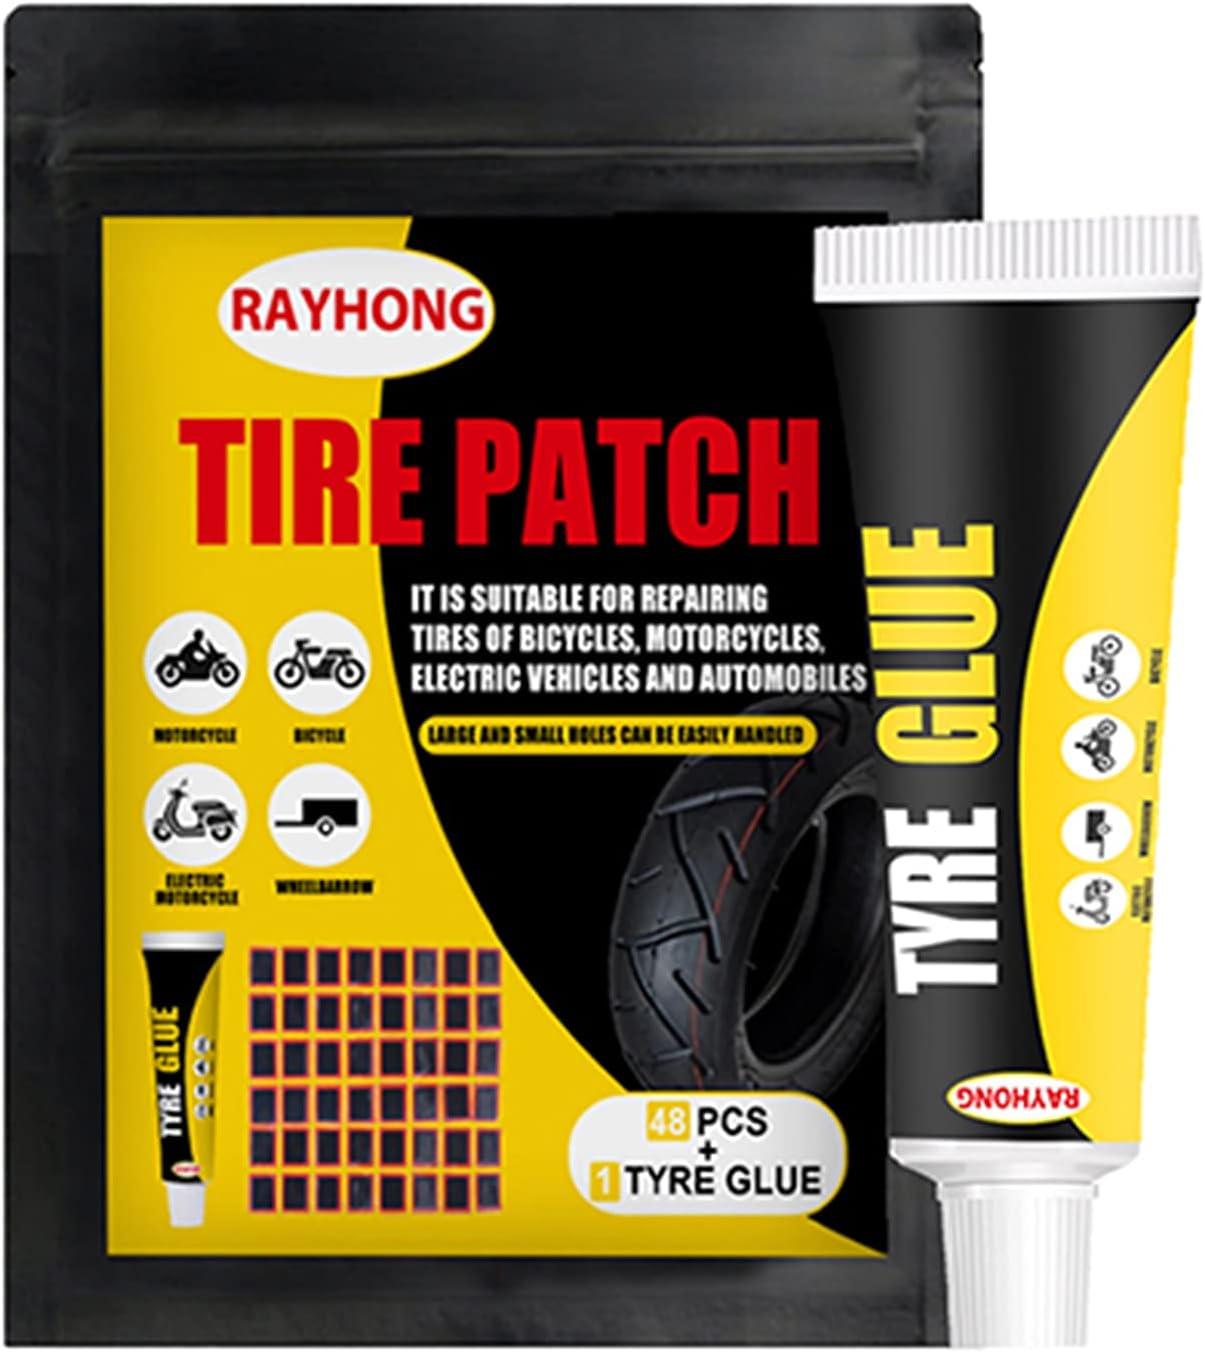 Hinbest Bike Inner Choice Tire Patch Kit Repairing Repair Stickers Selling and selling